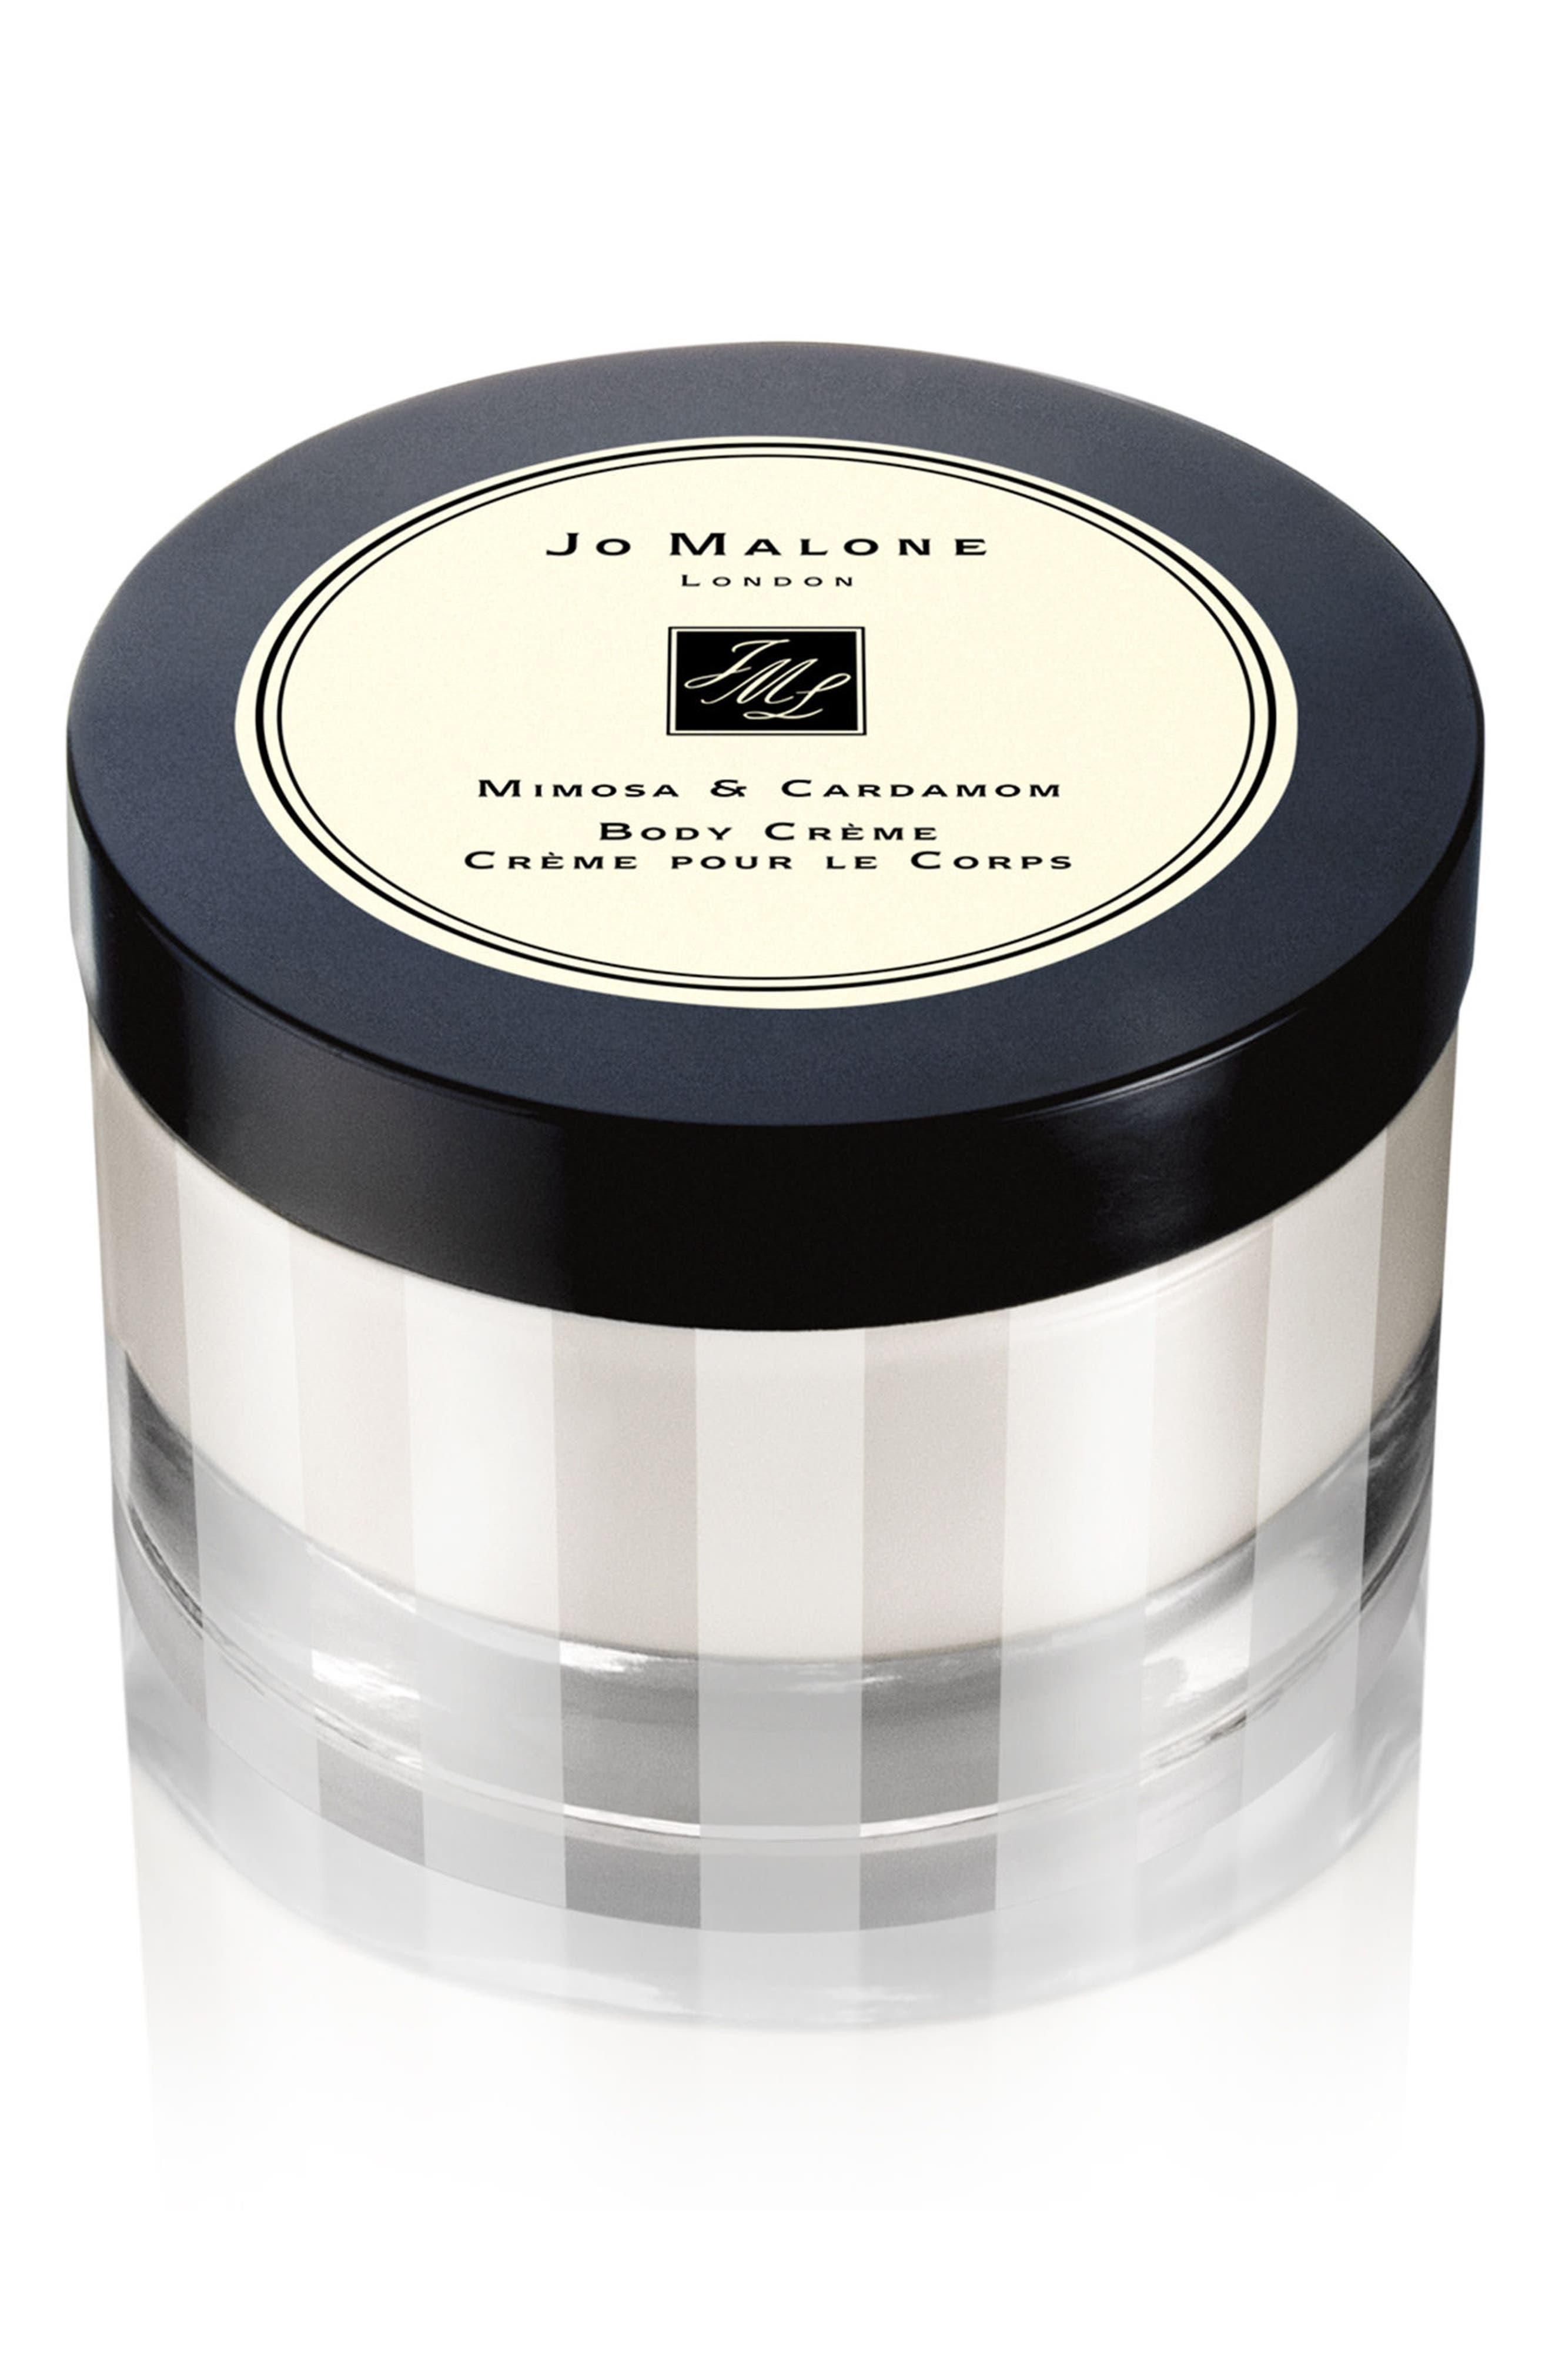 Jo Malone London™ Mimosa & Cardamom Body Crème